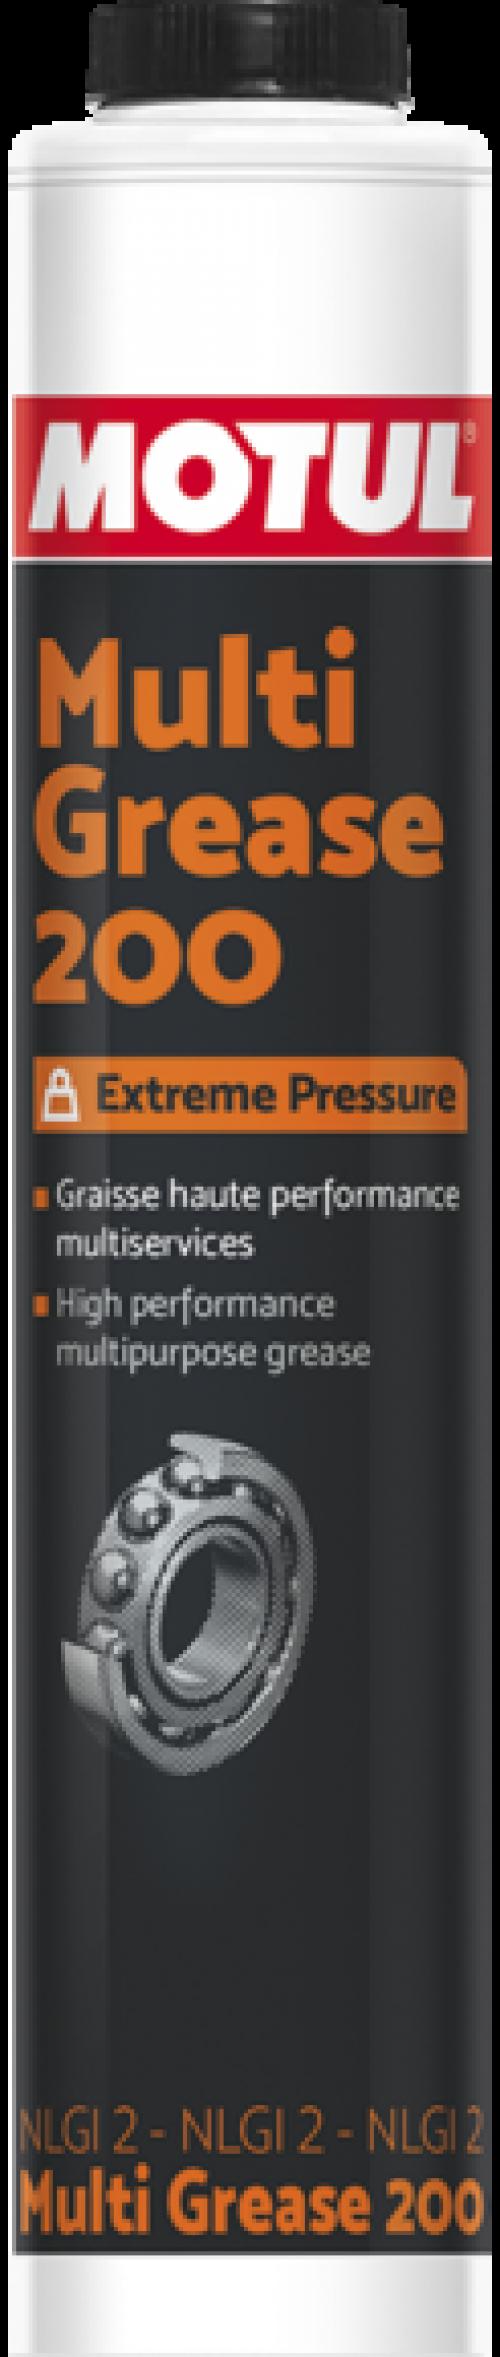 Пластичная смазка Motul MULTIGREASE 200